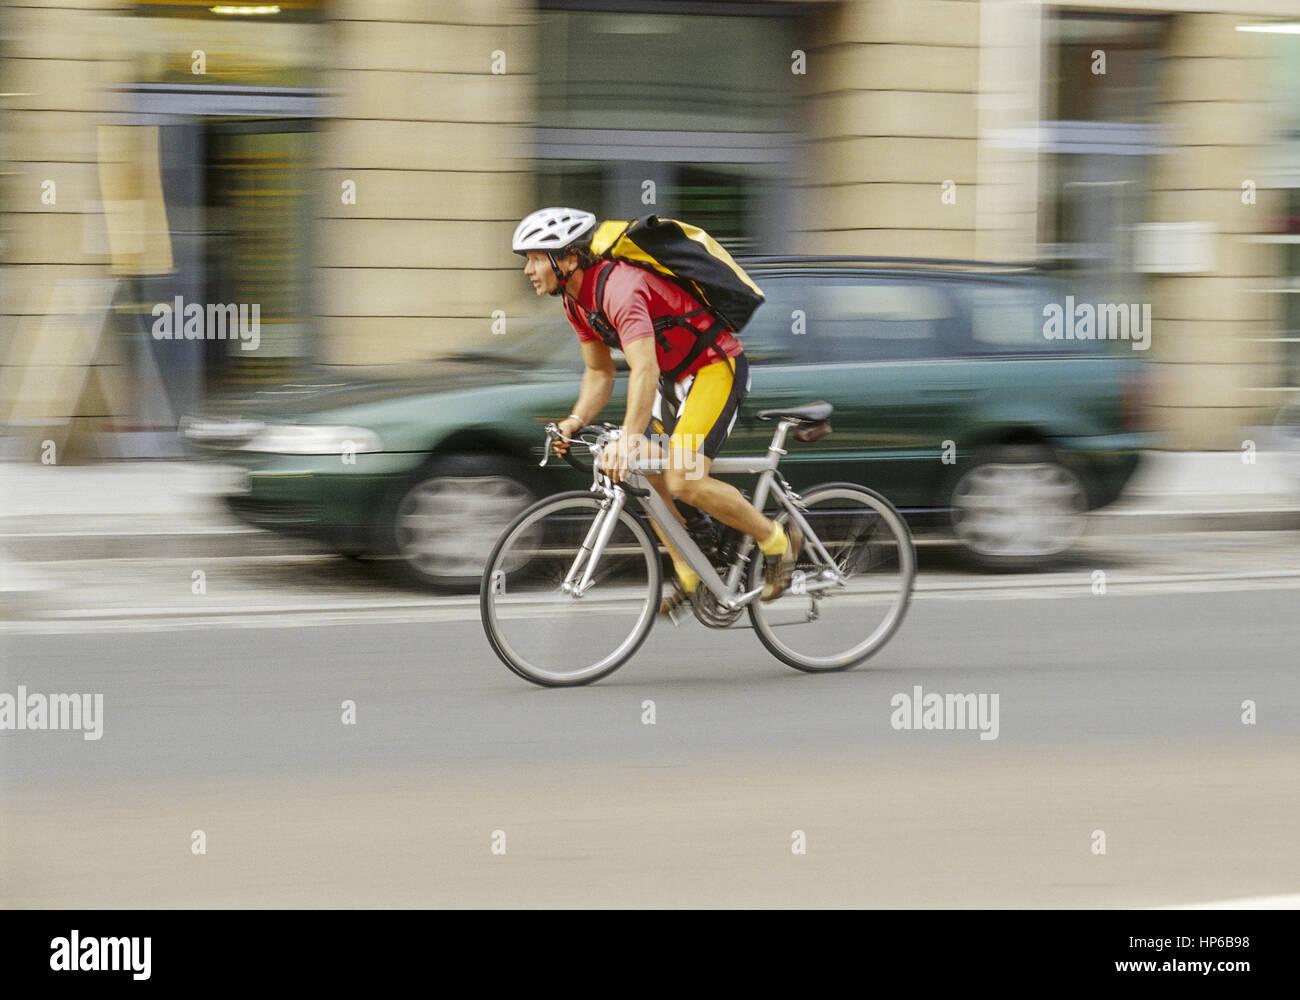 Fahrradkurier in Fahrt, Bewegung (model-released) Stock Photo